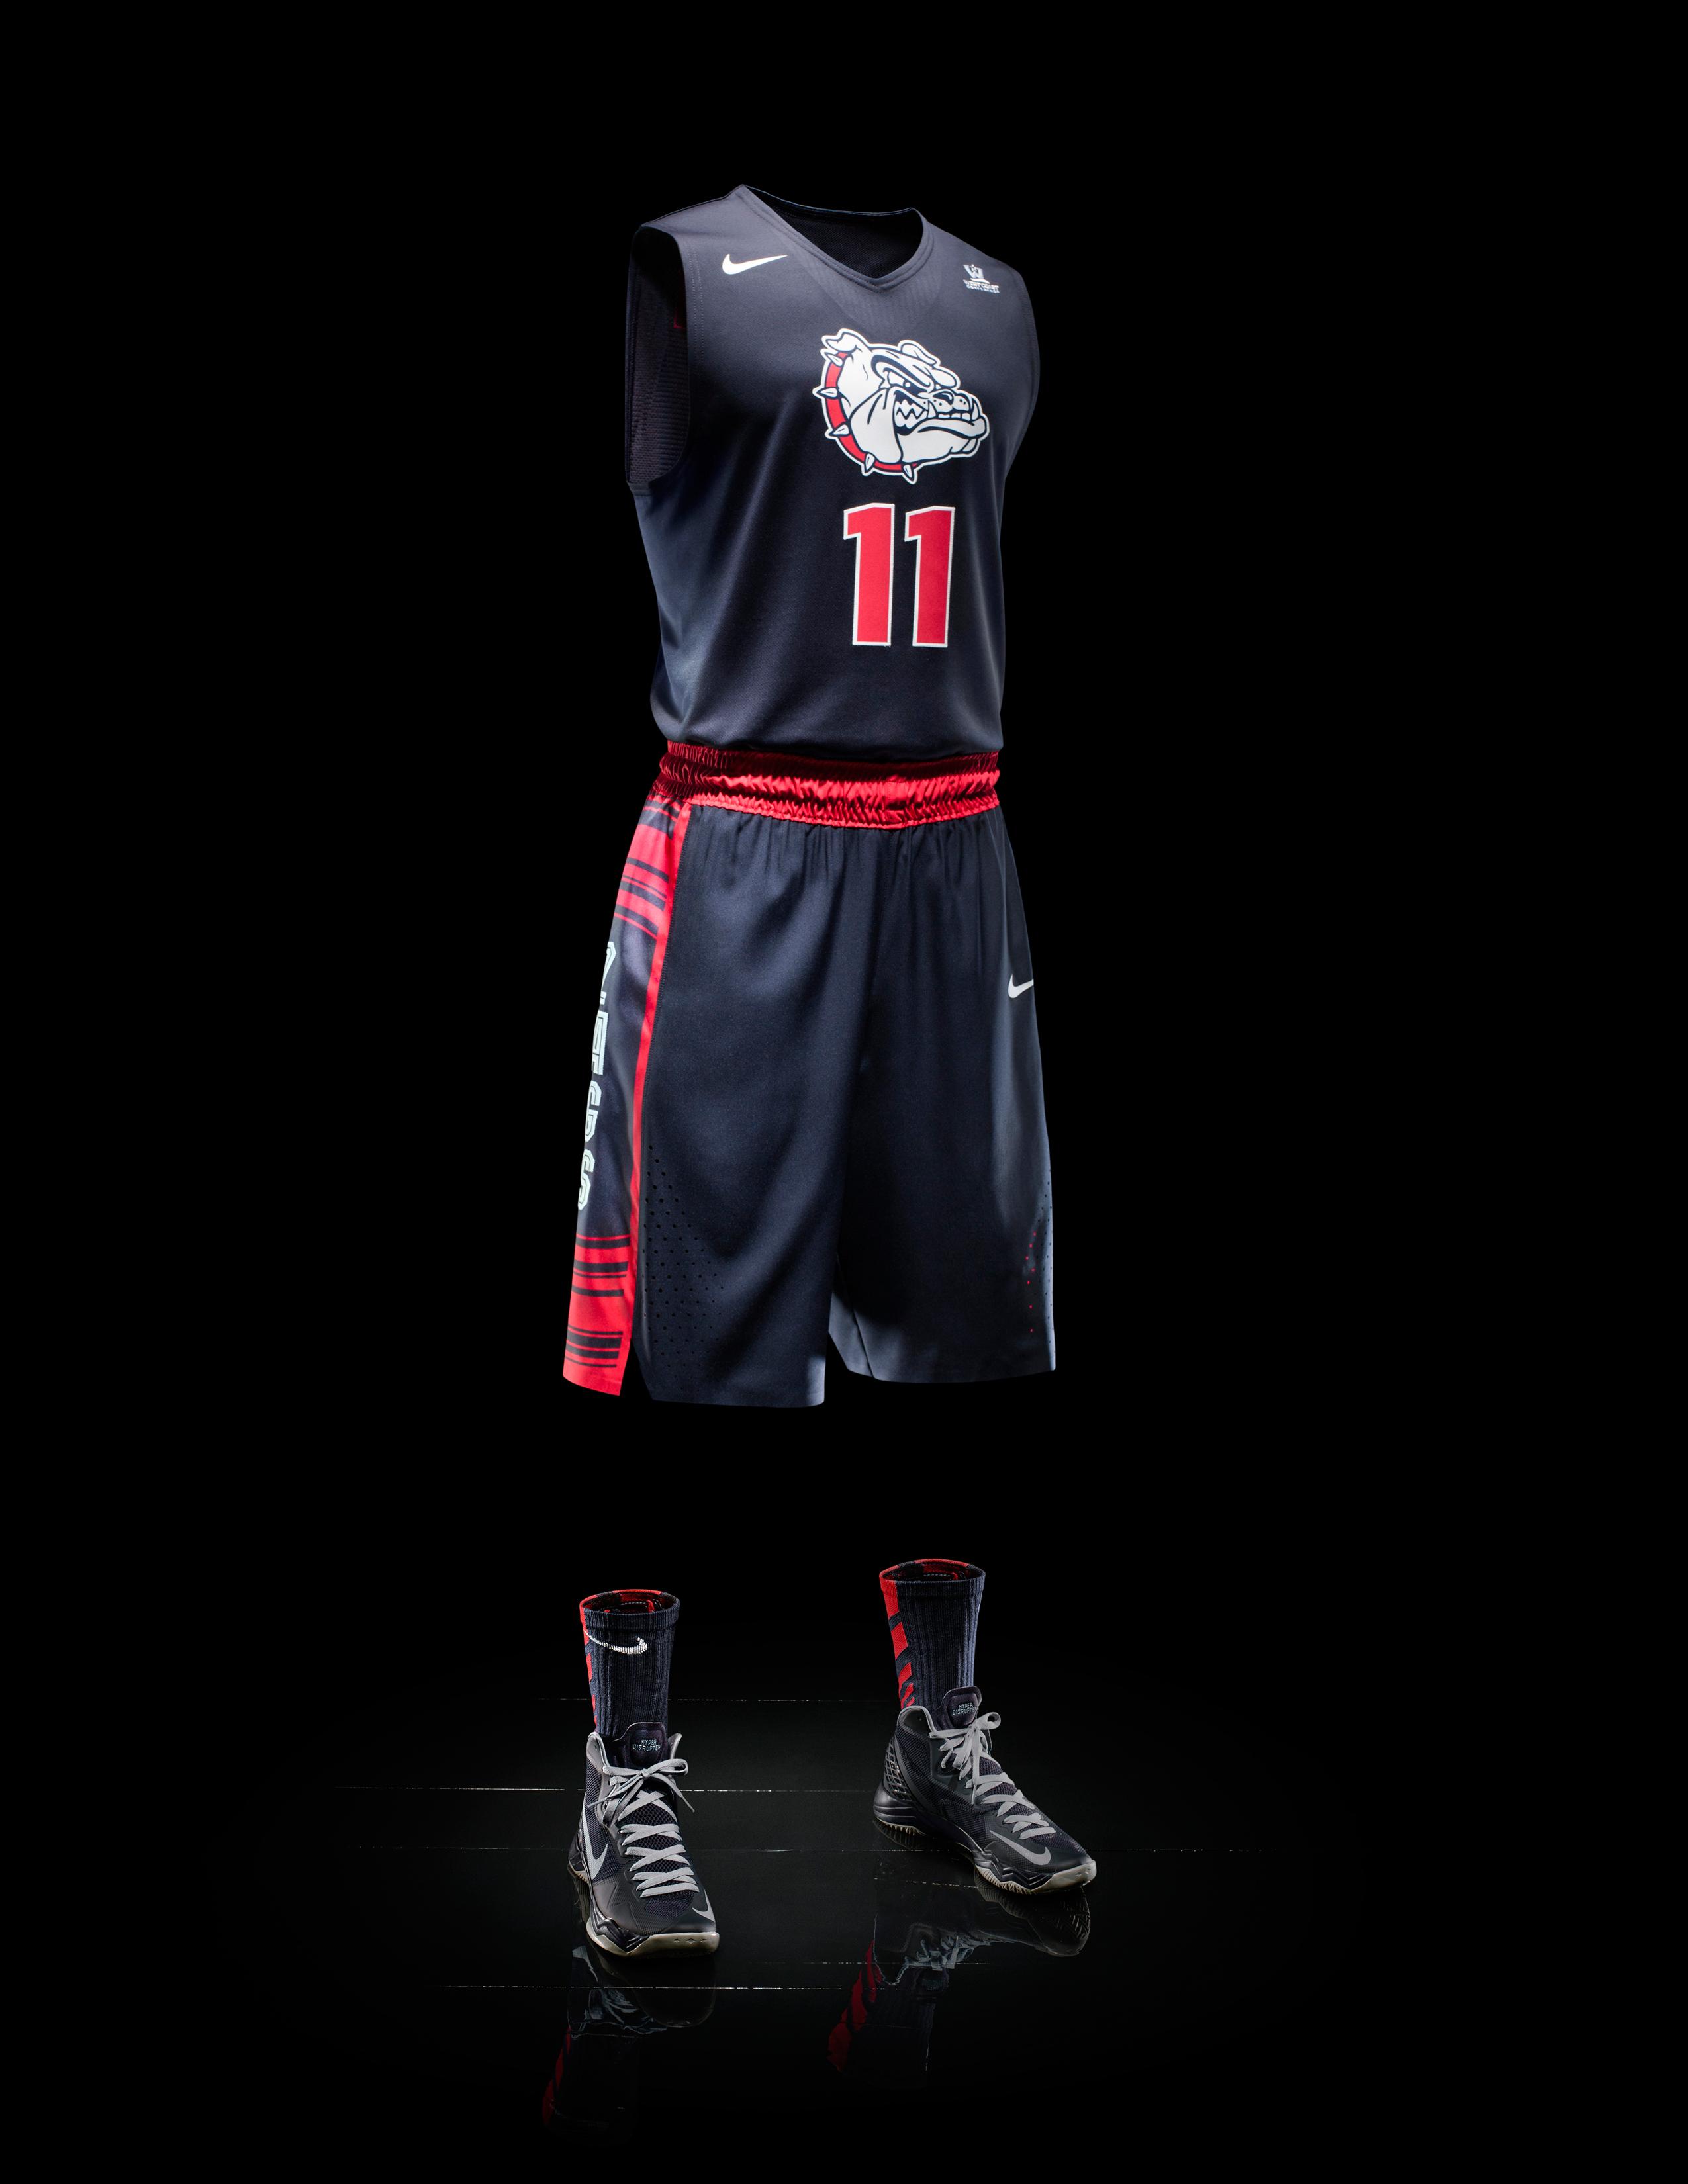 sneakers for cheap 0afa2 4821d Nike Custom Basketball Shirts | Top Mode Depot